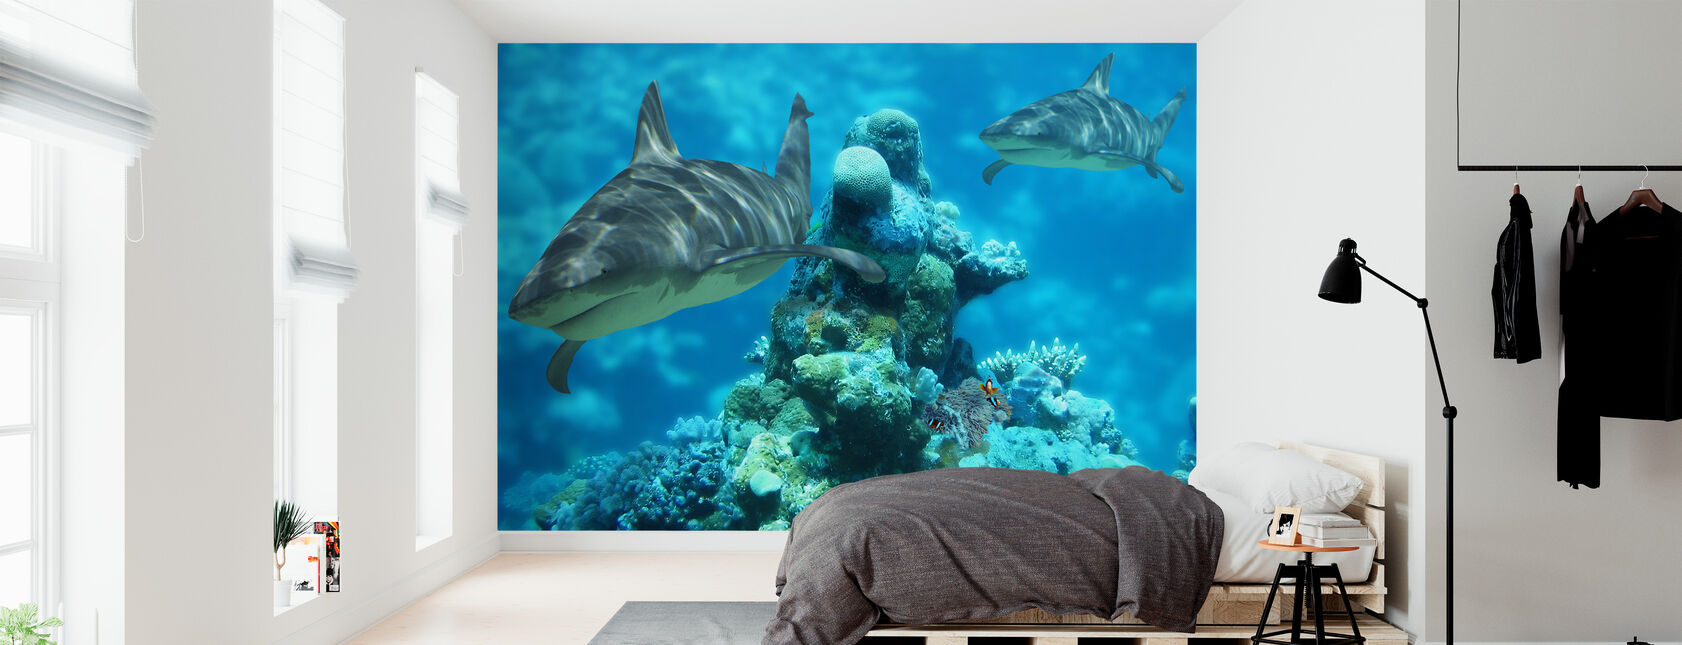 Shark Bommie - Wallpaper - Bedroom